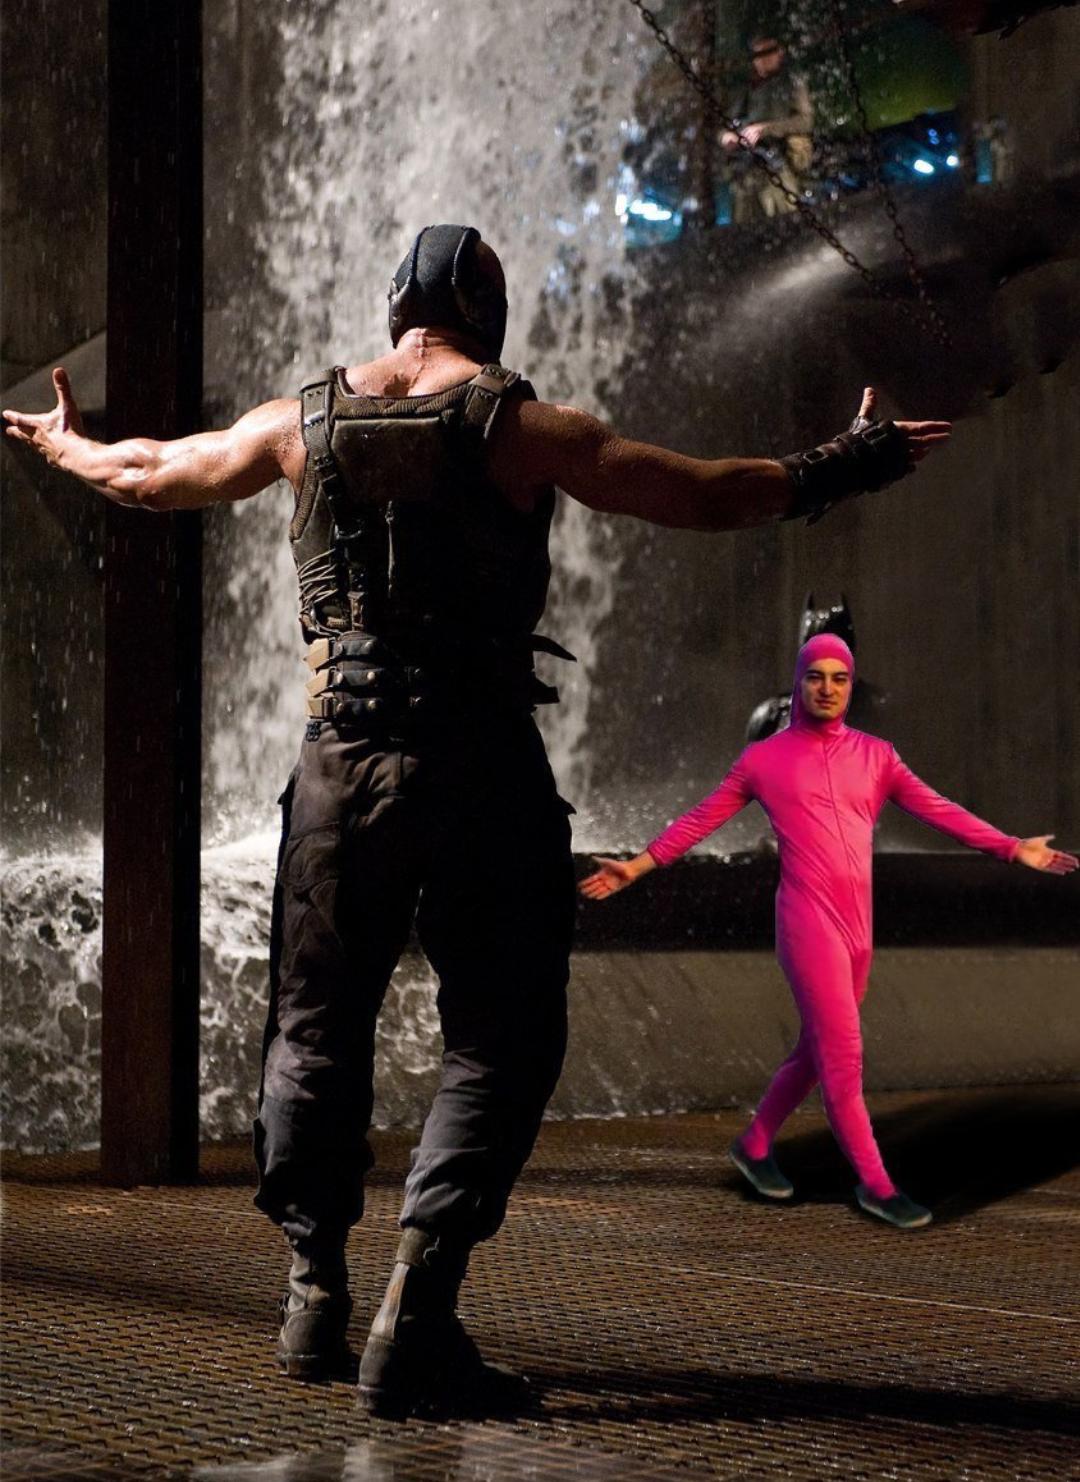 Bane vs Filthy Frank Memes - Imgflip